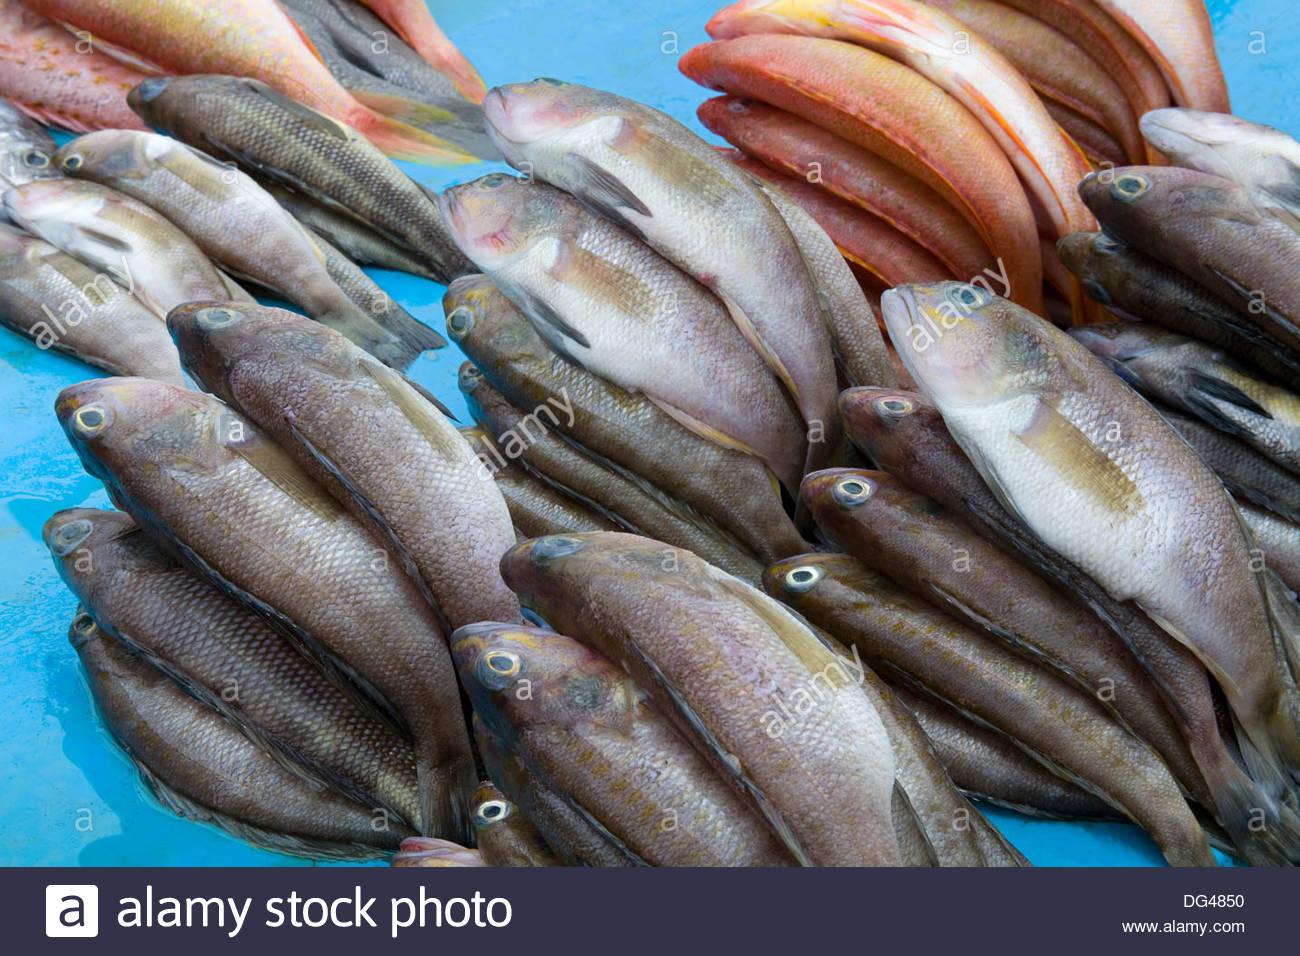 Fish market on tarqui beach city of manta ecuador south for Fishing in ecuador